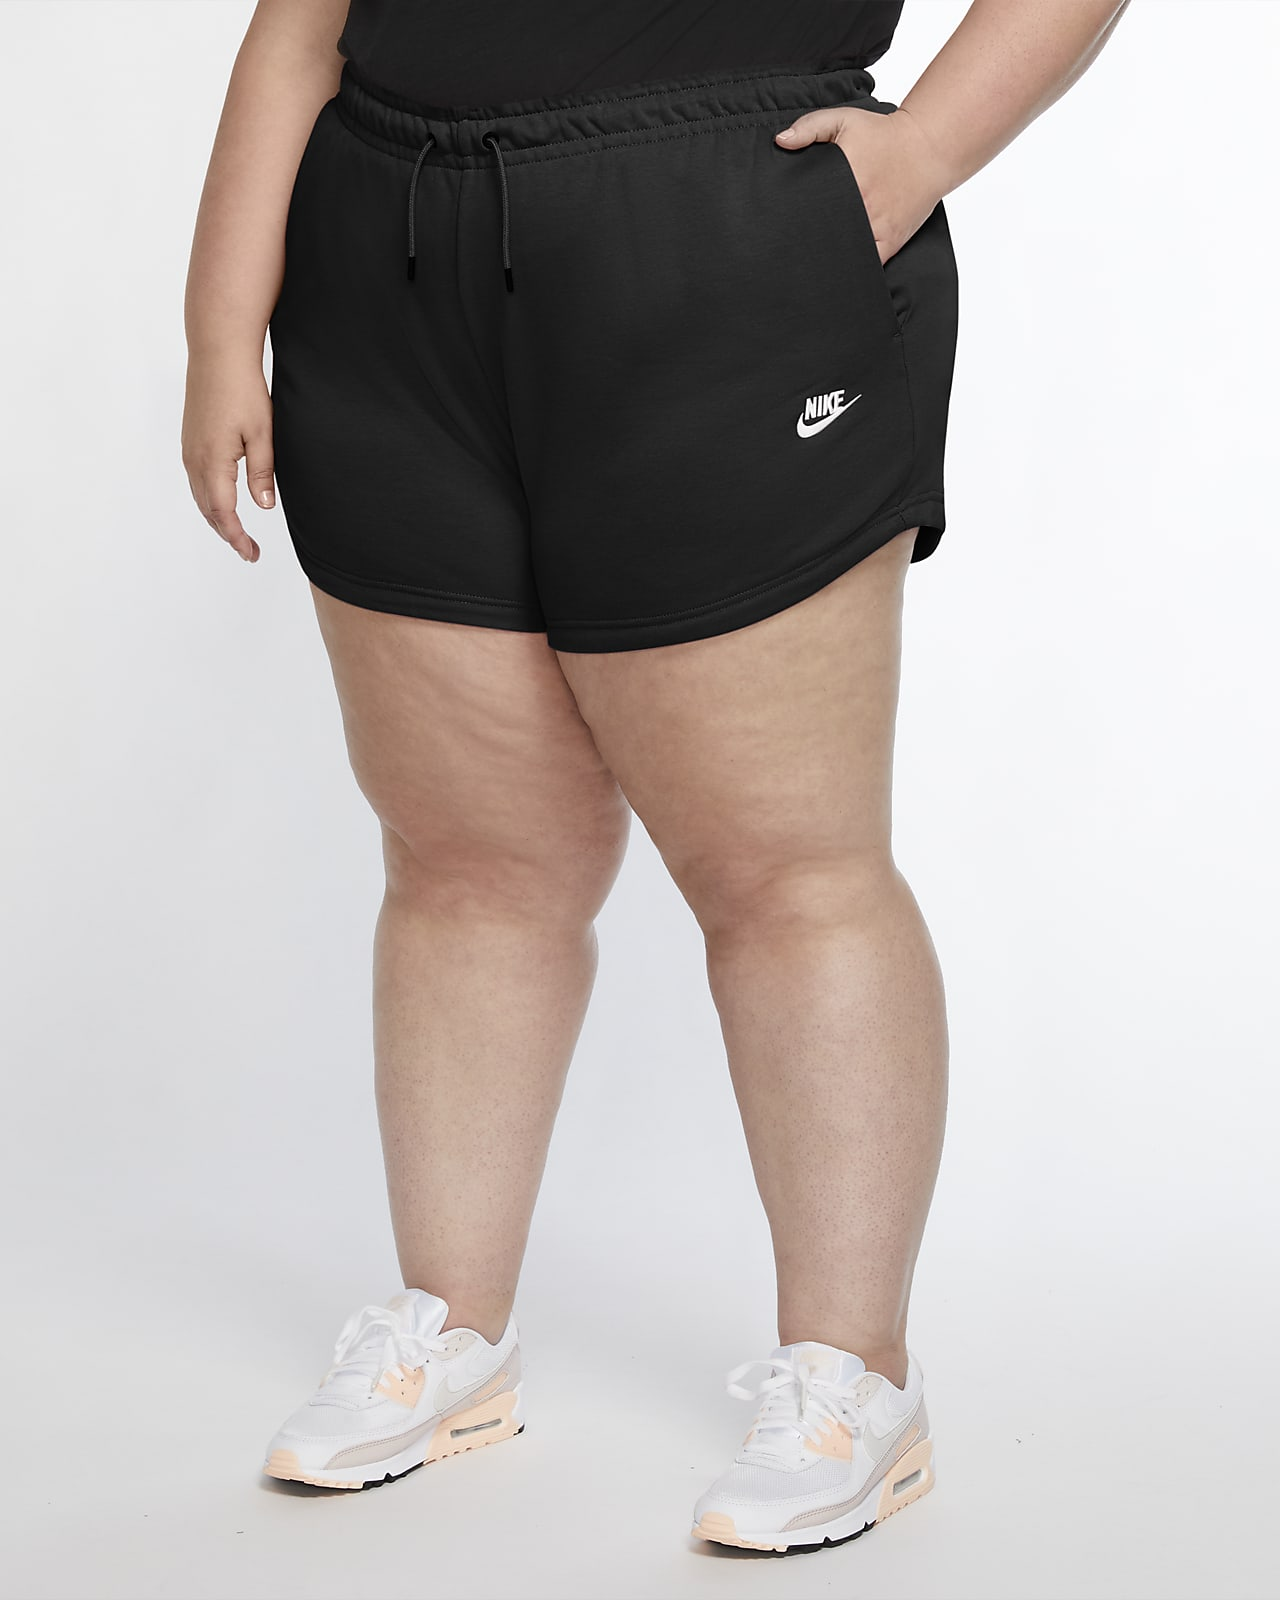 Short Nike Sportswear pour Femme (grande taille) mannequin grande taille Nike